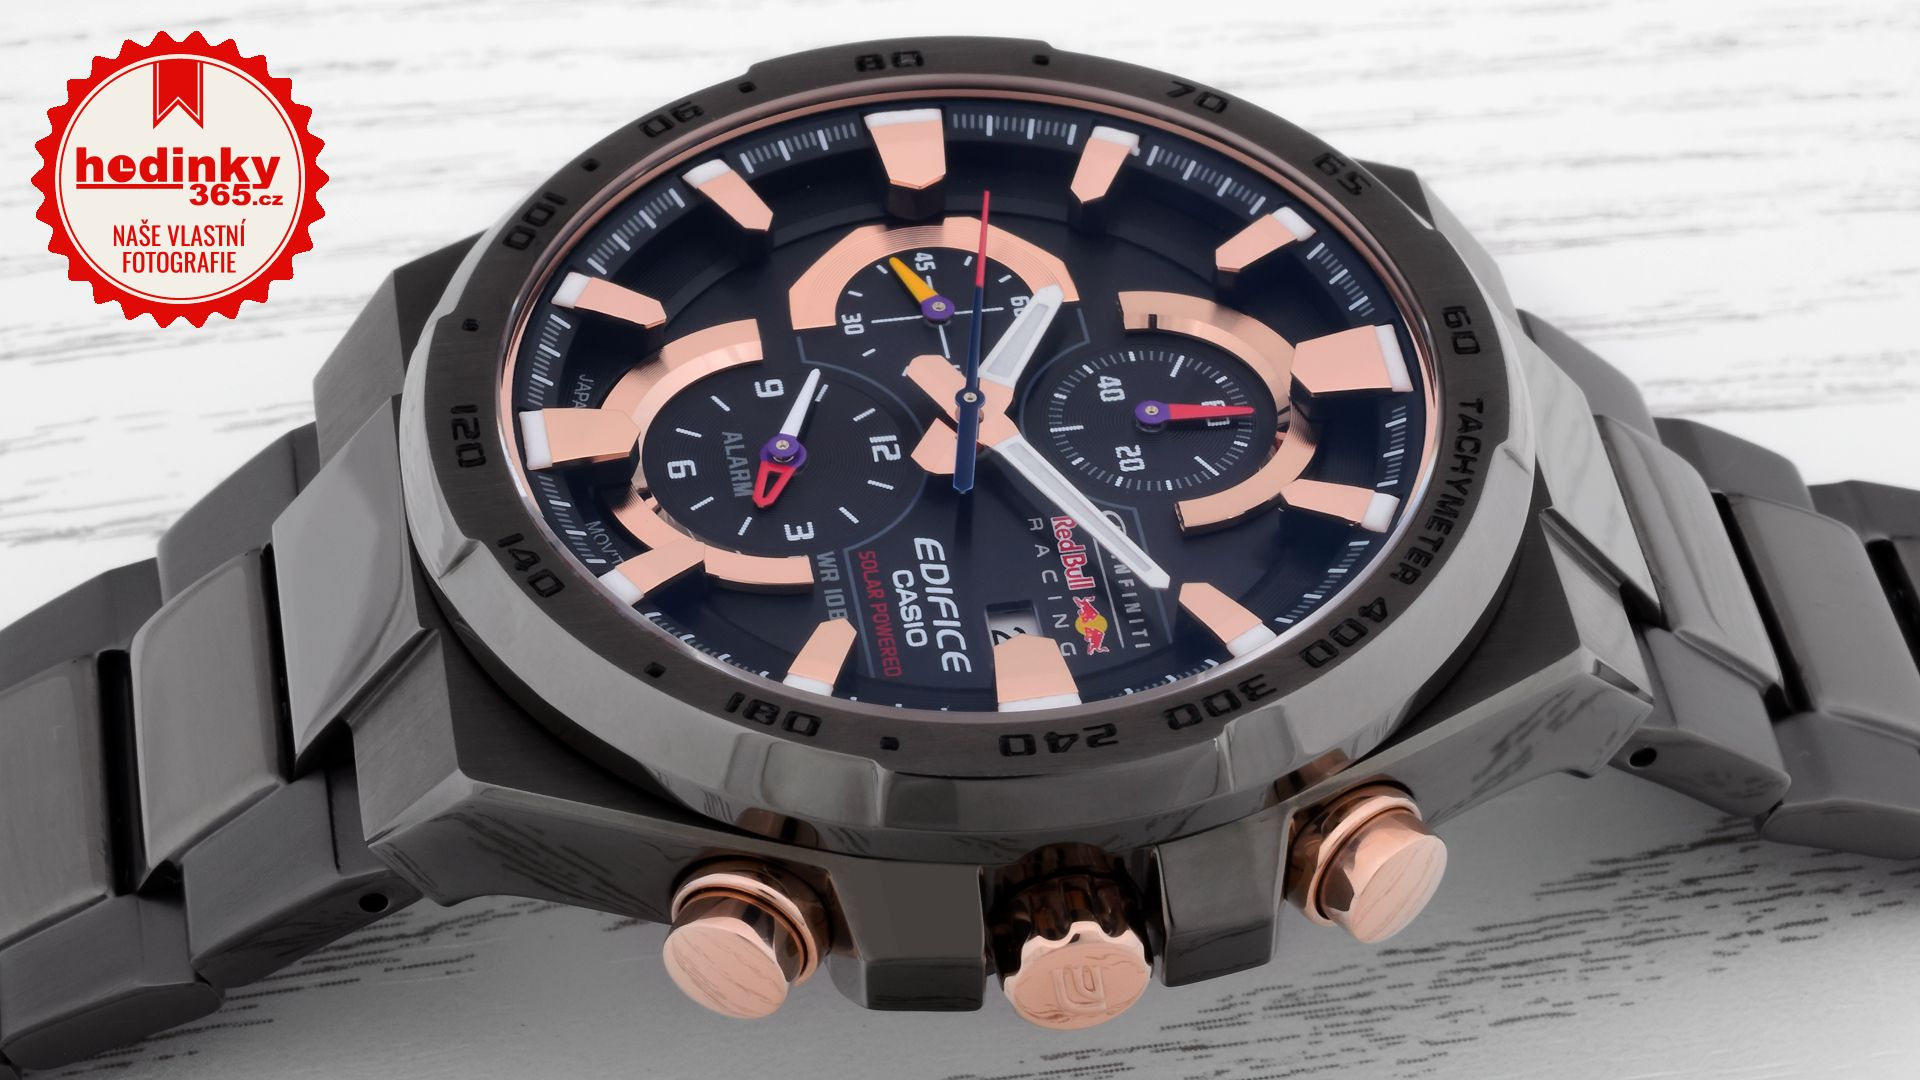 Casio Edifice EFR-541SBRB-1AEF Infiniti Red Bull Racing Limited Edition. Pánské  hodinky - ocelový řemínek 693ae54533